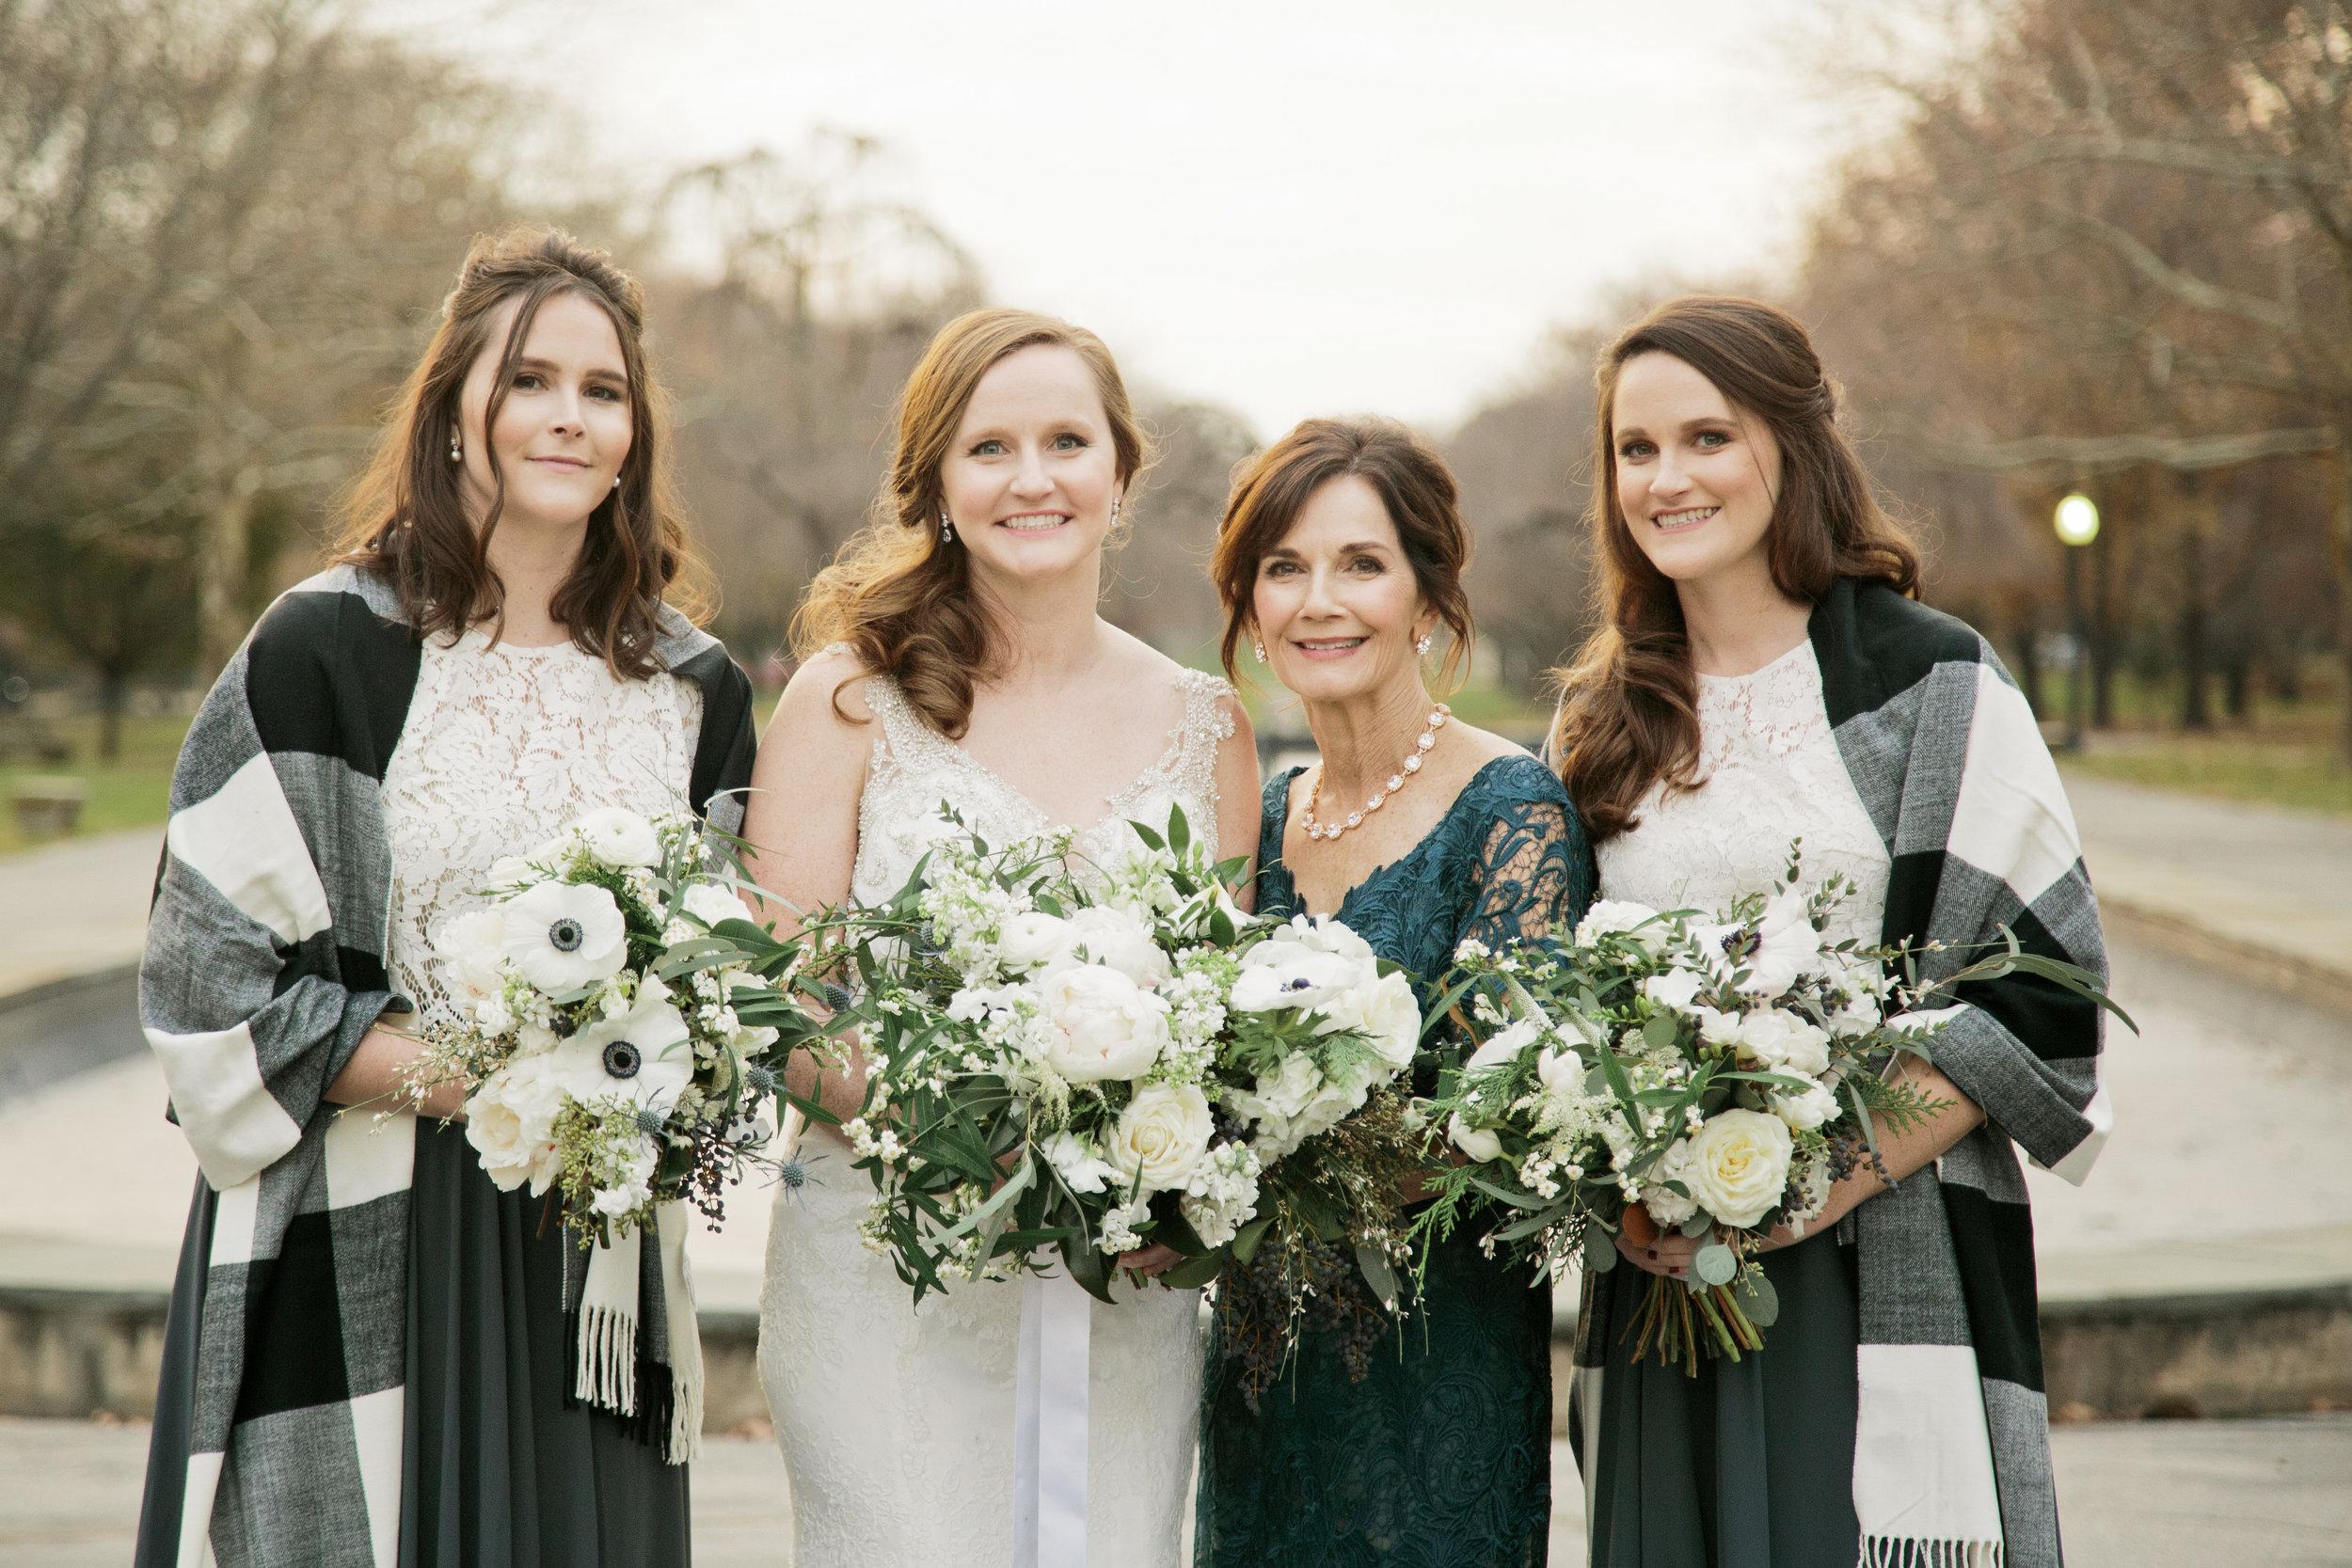 Hudson-Nichols-Martha-Stewart-Weddings-Winter-Ski-Philadelphia-Claire-Conner_088.jpg